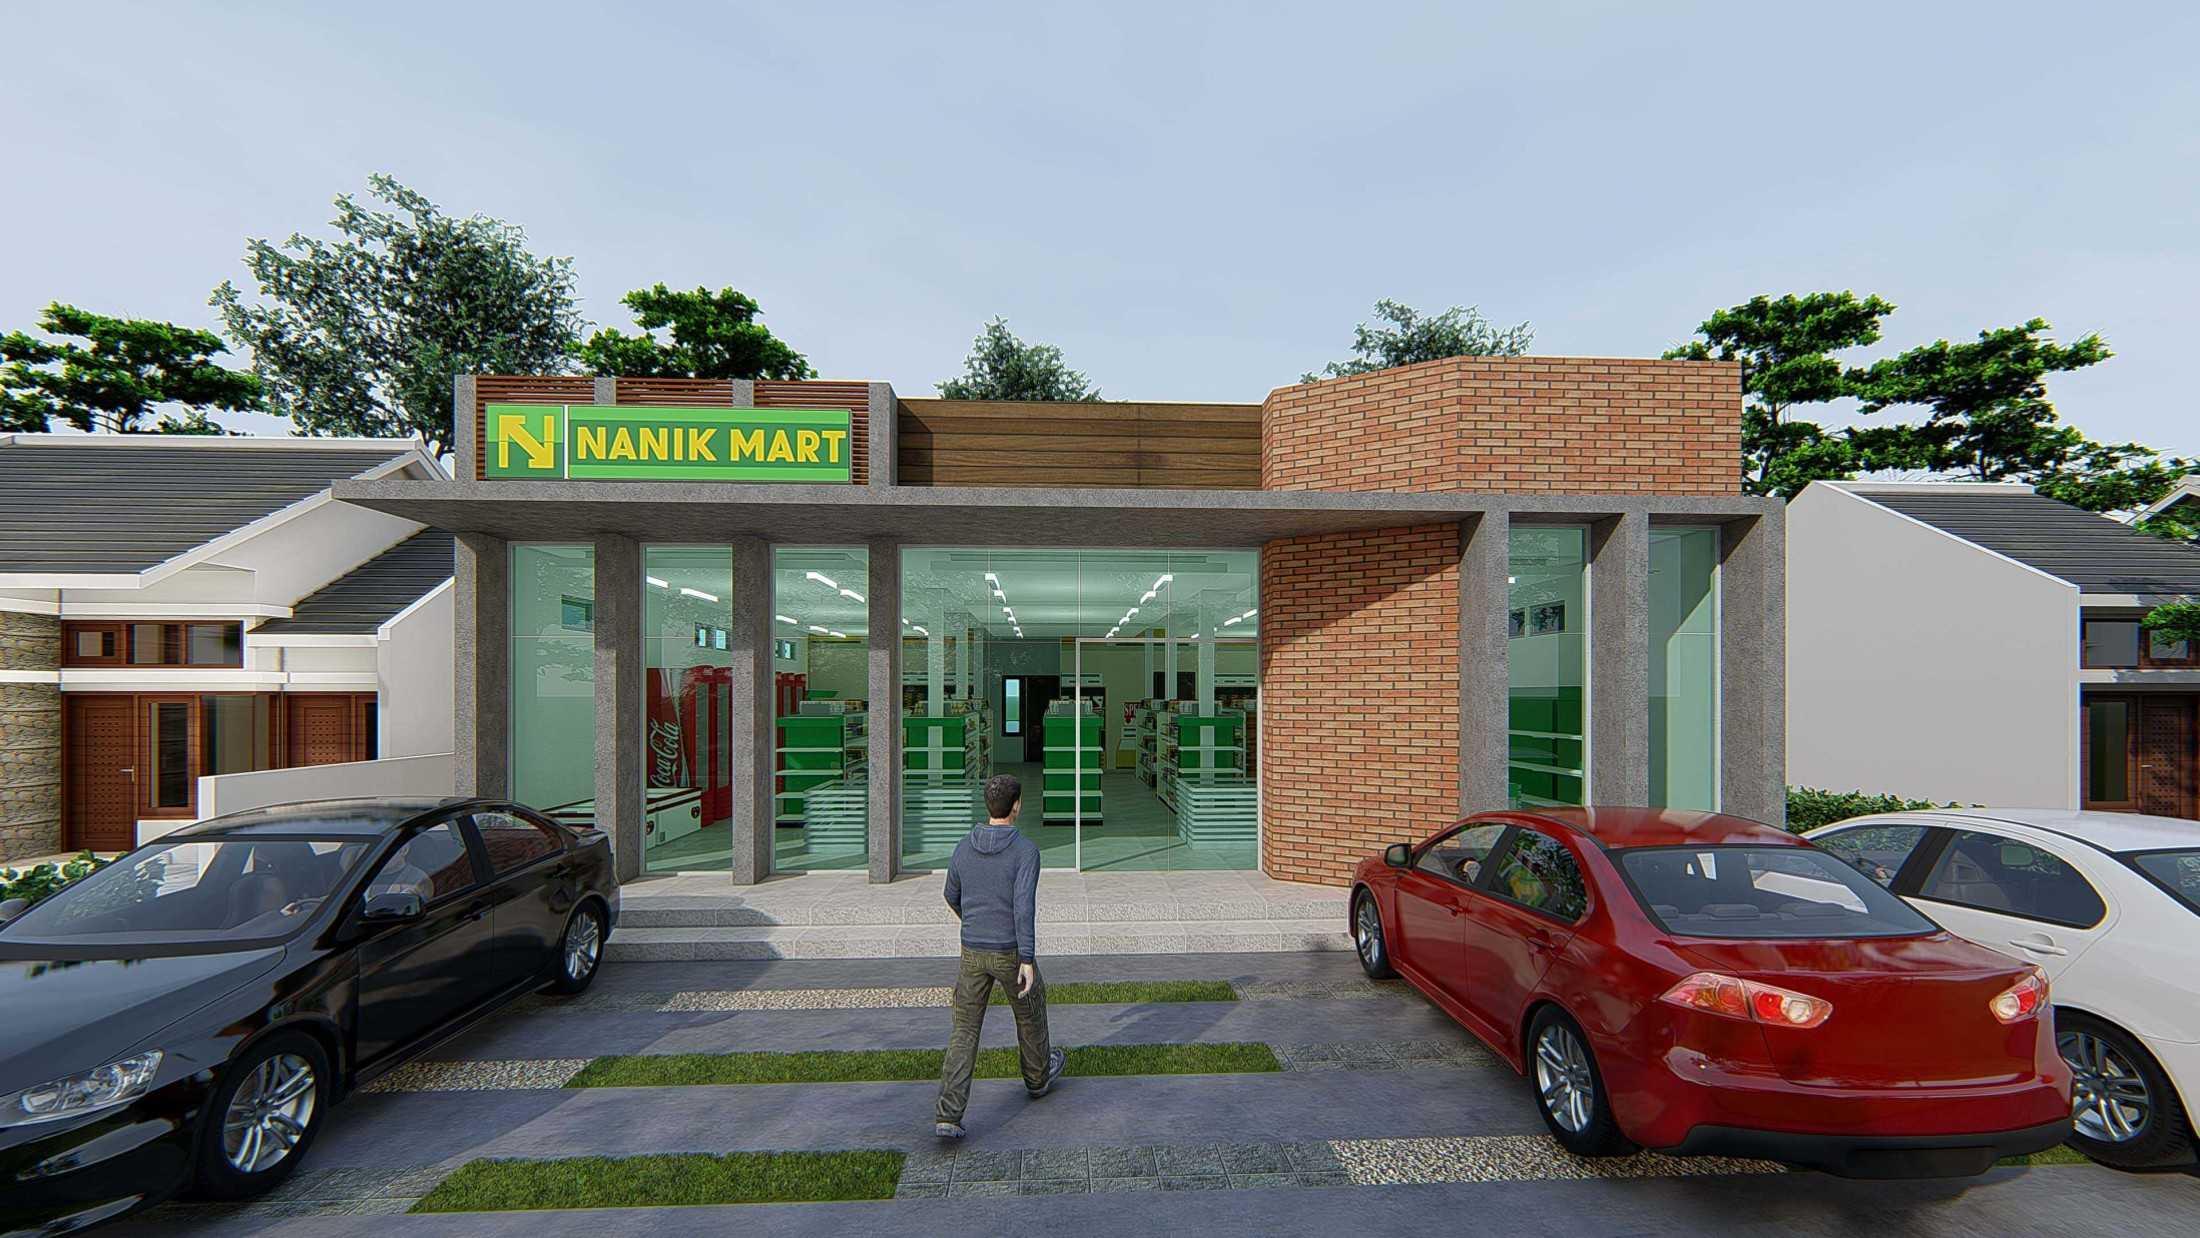 "Ark-Chitect Studio Mini Market ""nanik Mart"" Kebun Bunga, Kec. Sukarami, Kota Palembang, Sumatera Selatan, Indonesia Kebun Bunga, Kec. Sukarami, Kota Palembang, Sumatera Selatan, Indonesia Ark-Chitect-Studio-Mini-Market-Nanik-Mart  81701"